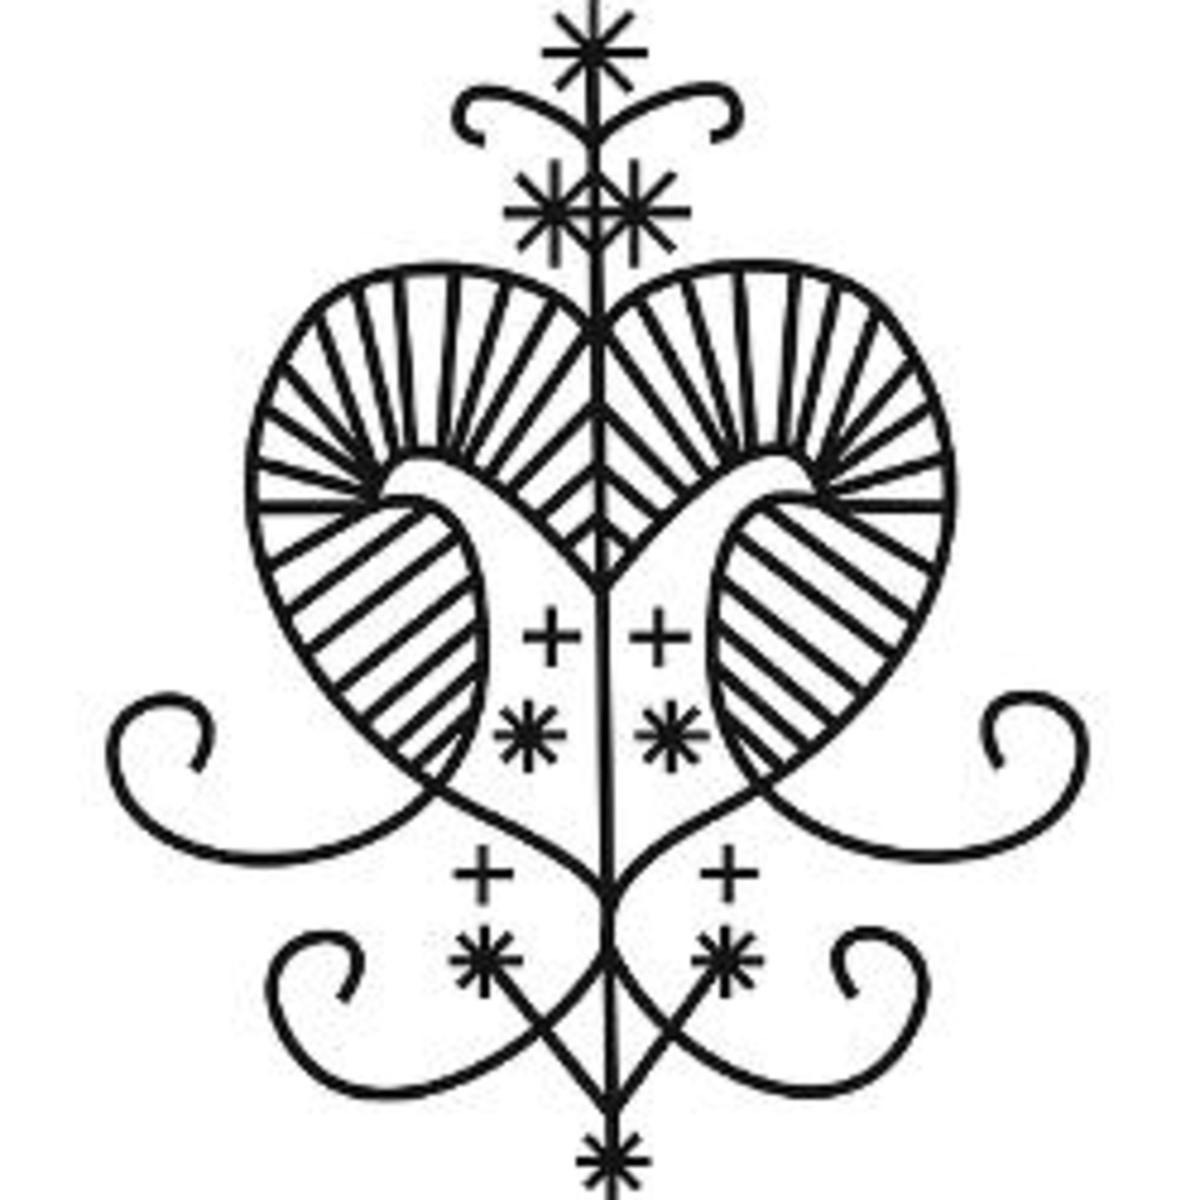 Traditional Erzulie Freda Veve, public domain.